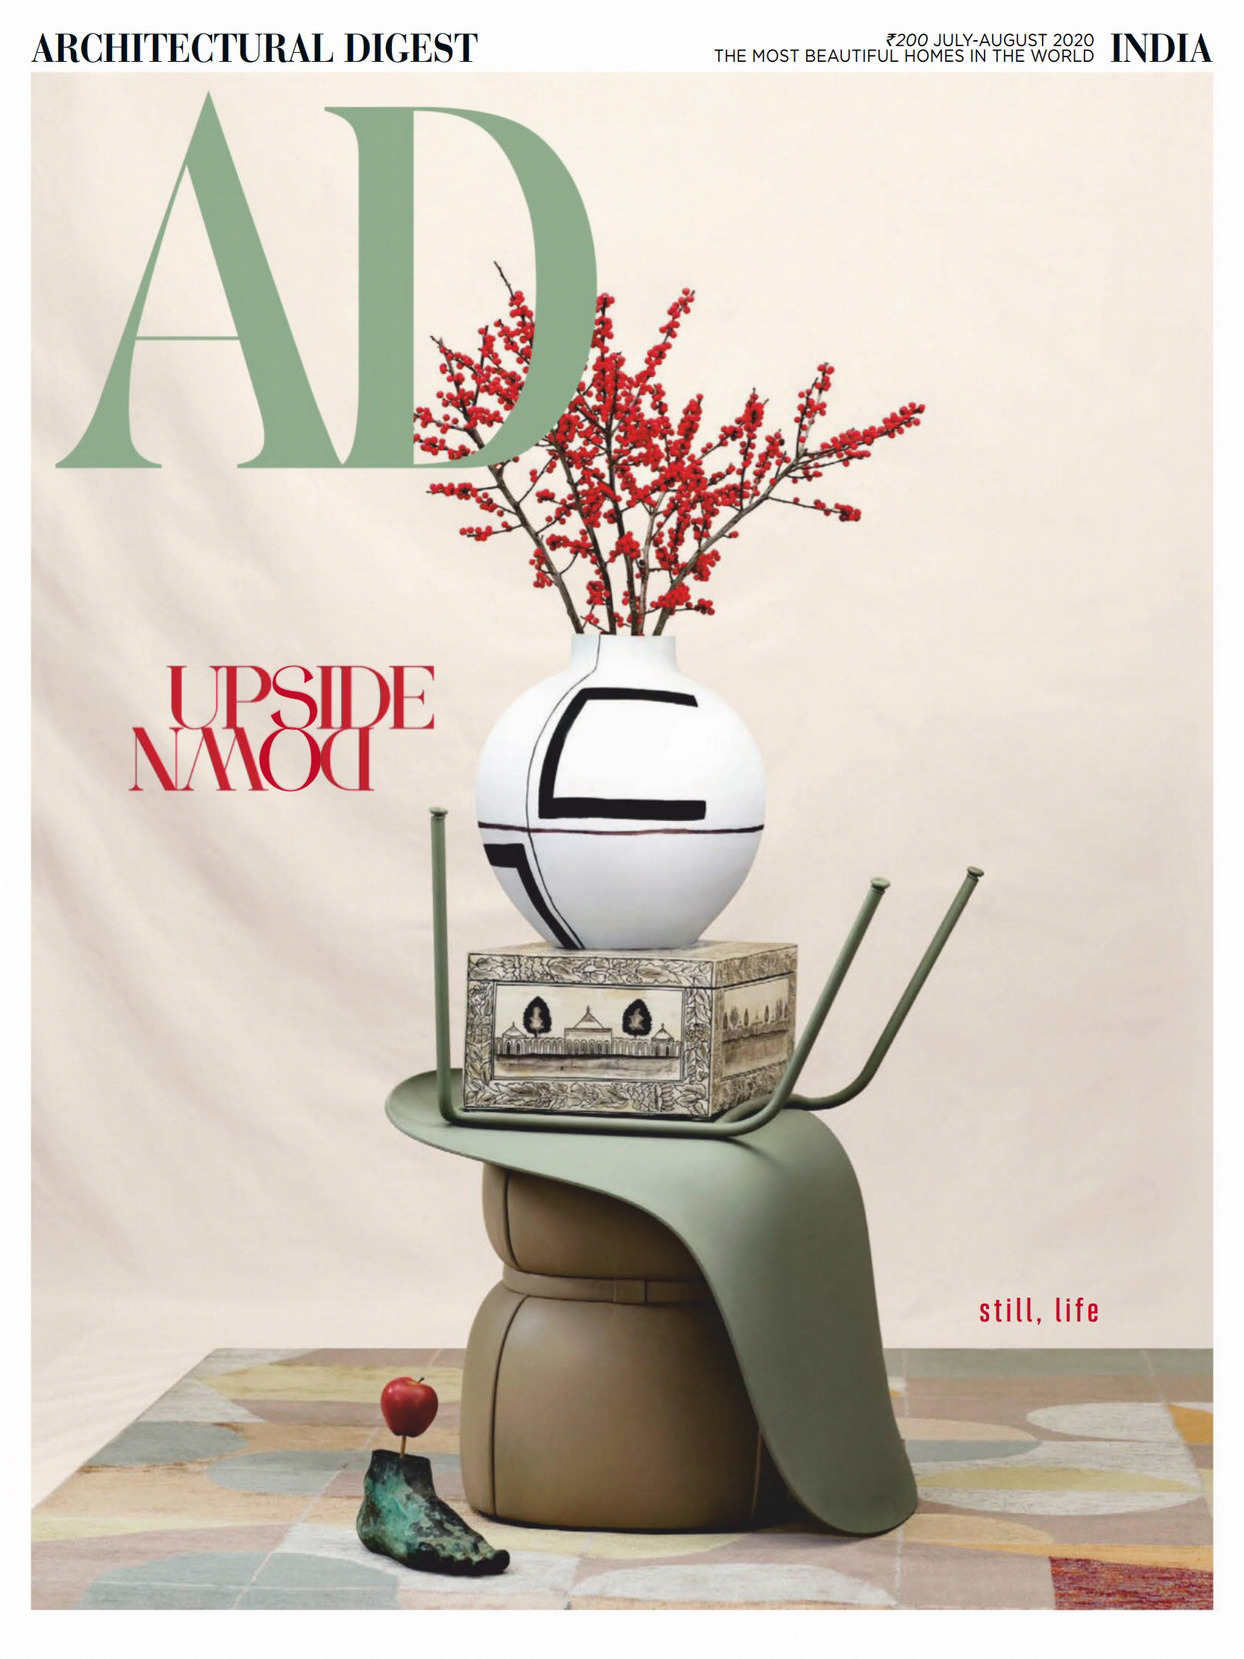 《AD》印度版室内室外设计杂志2020年07-08月号